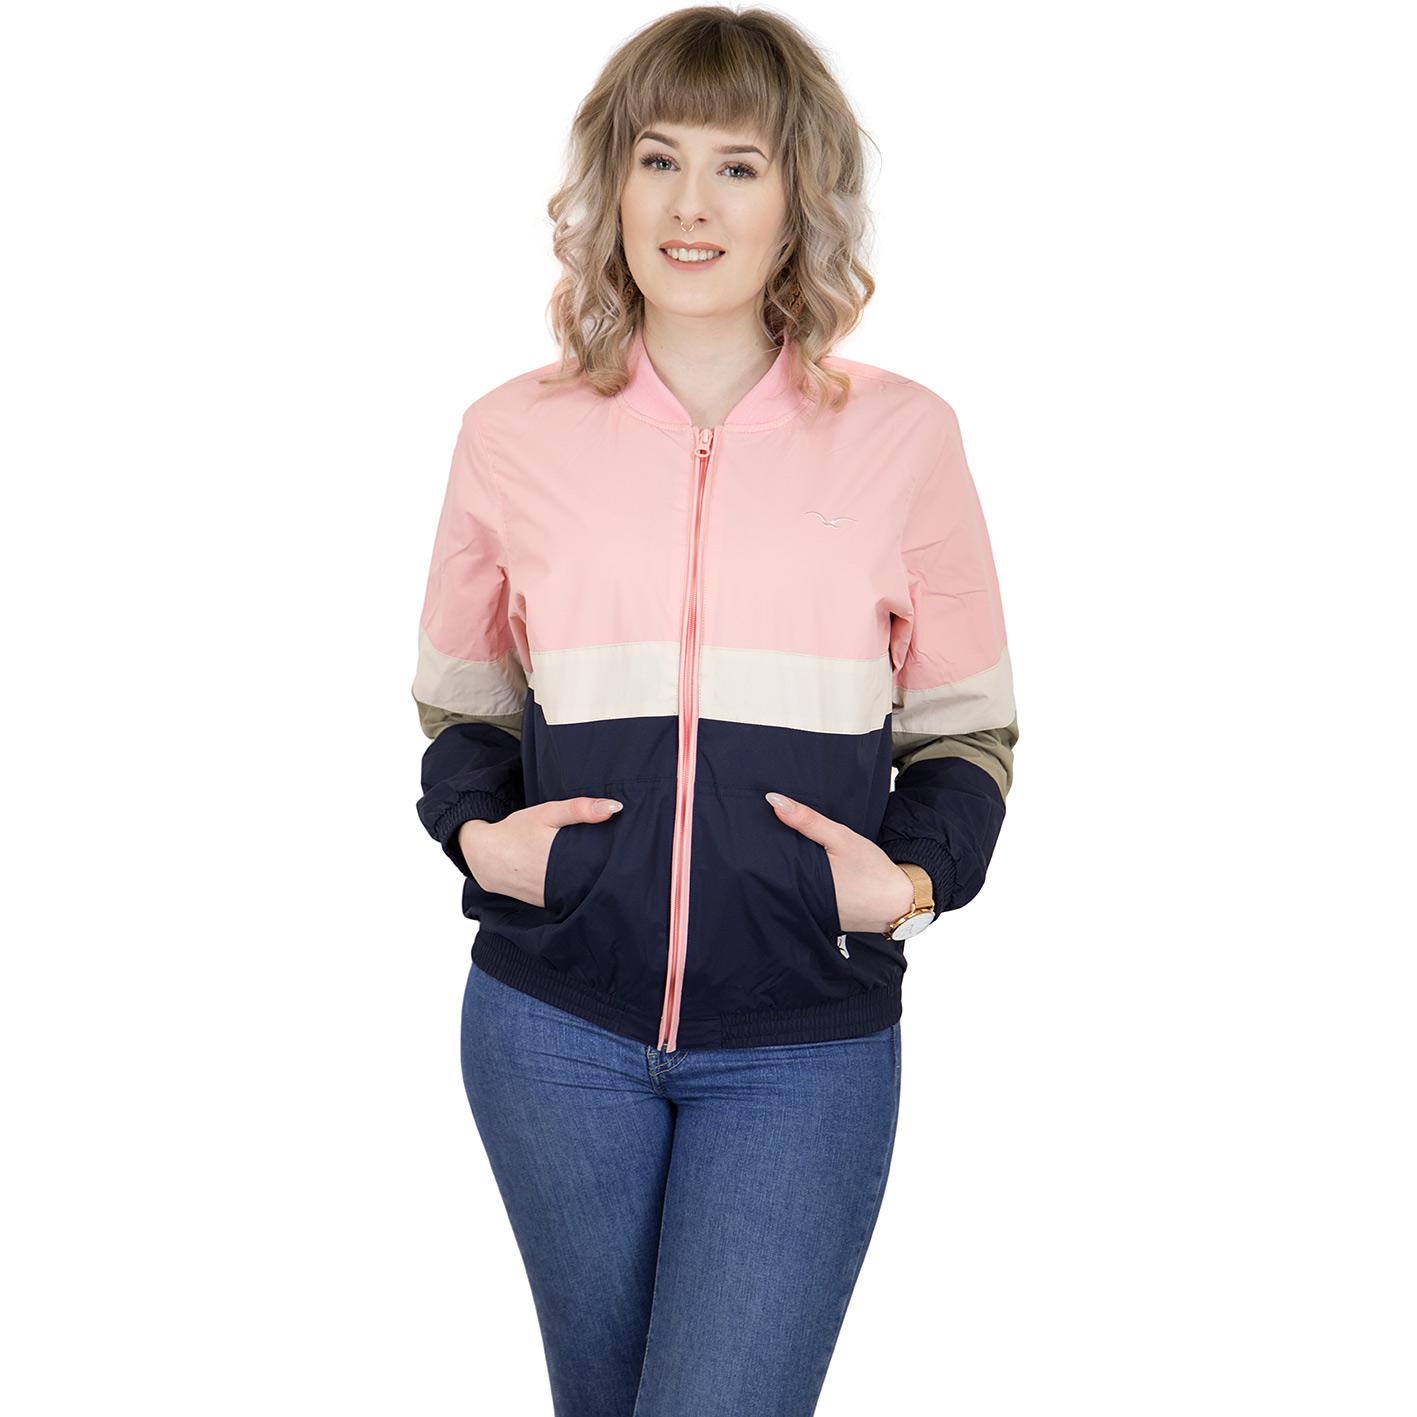 promo code 0ae13 2d6ea Cleptomanicx Damen Jacke Sailor rosa/weiß/dunkelblau